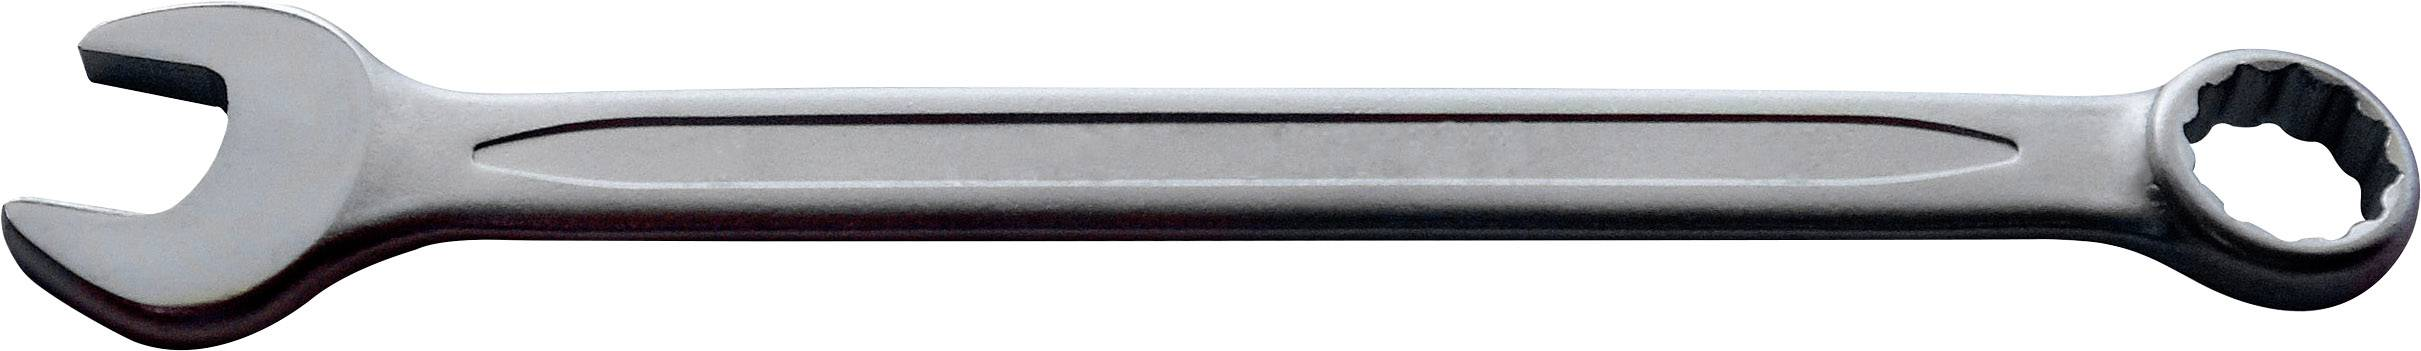 Očkoplochý kľúč/e TOOLCRAFT 820832, 8 mm